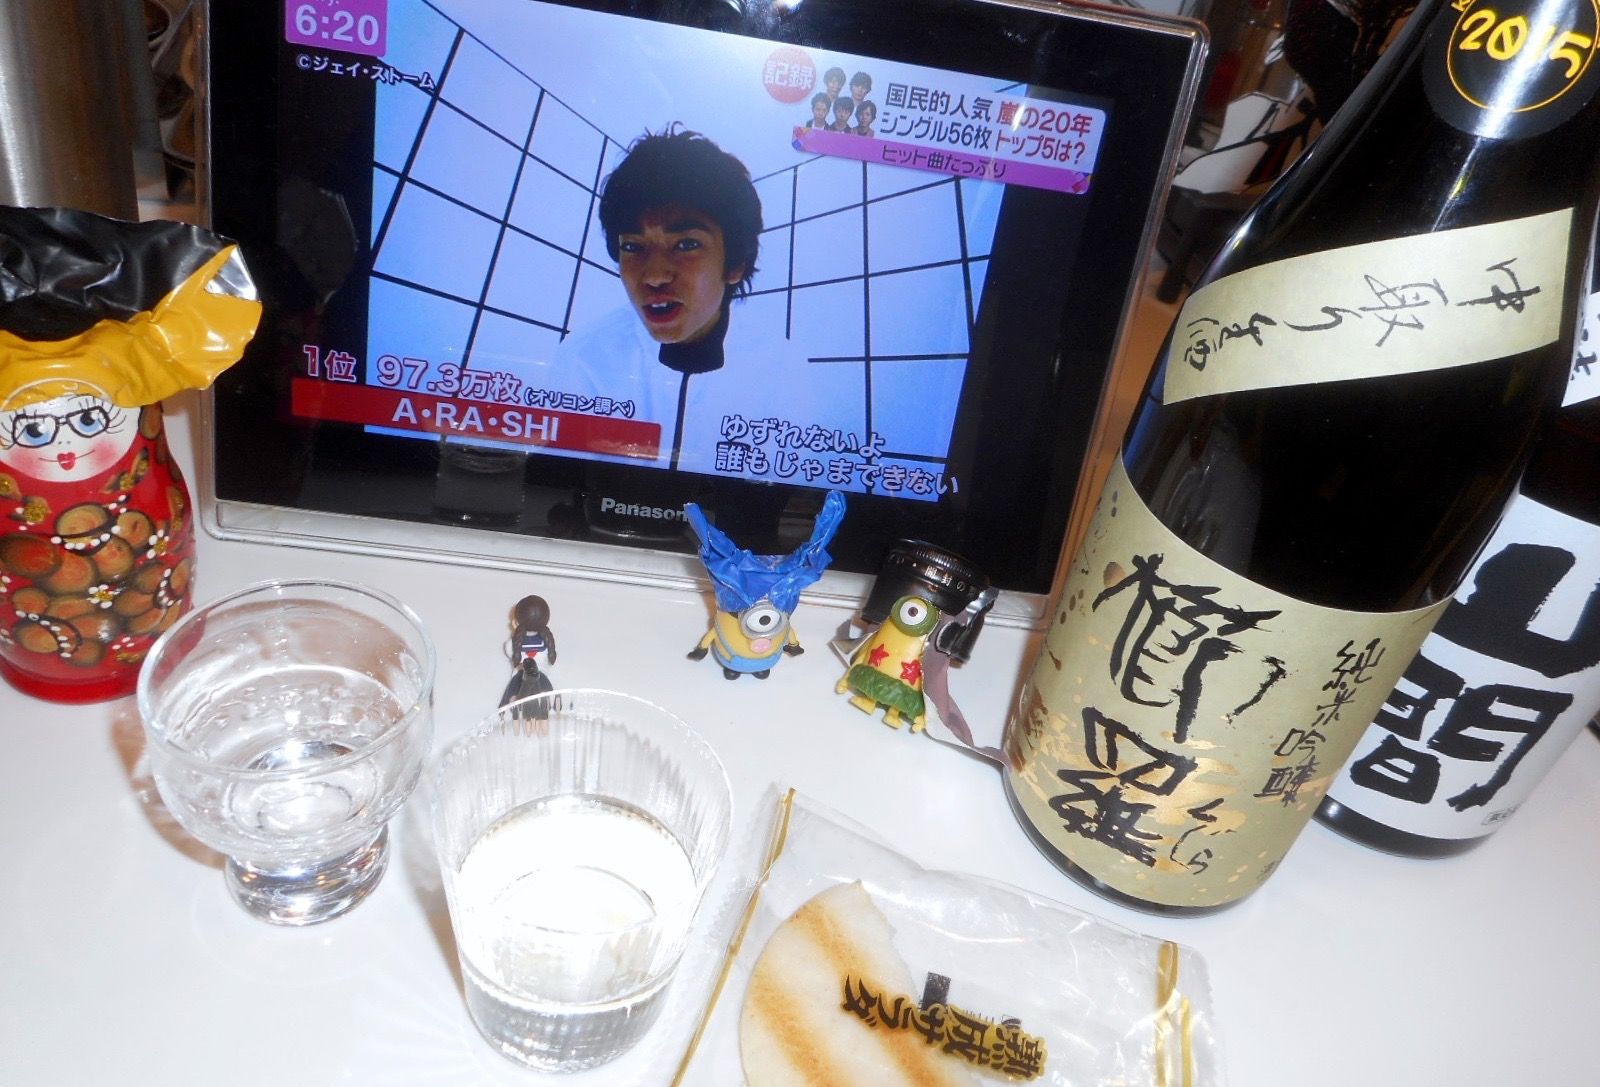 kujira2015_3_8.jpg